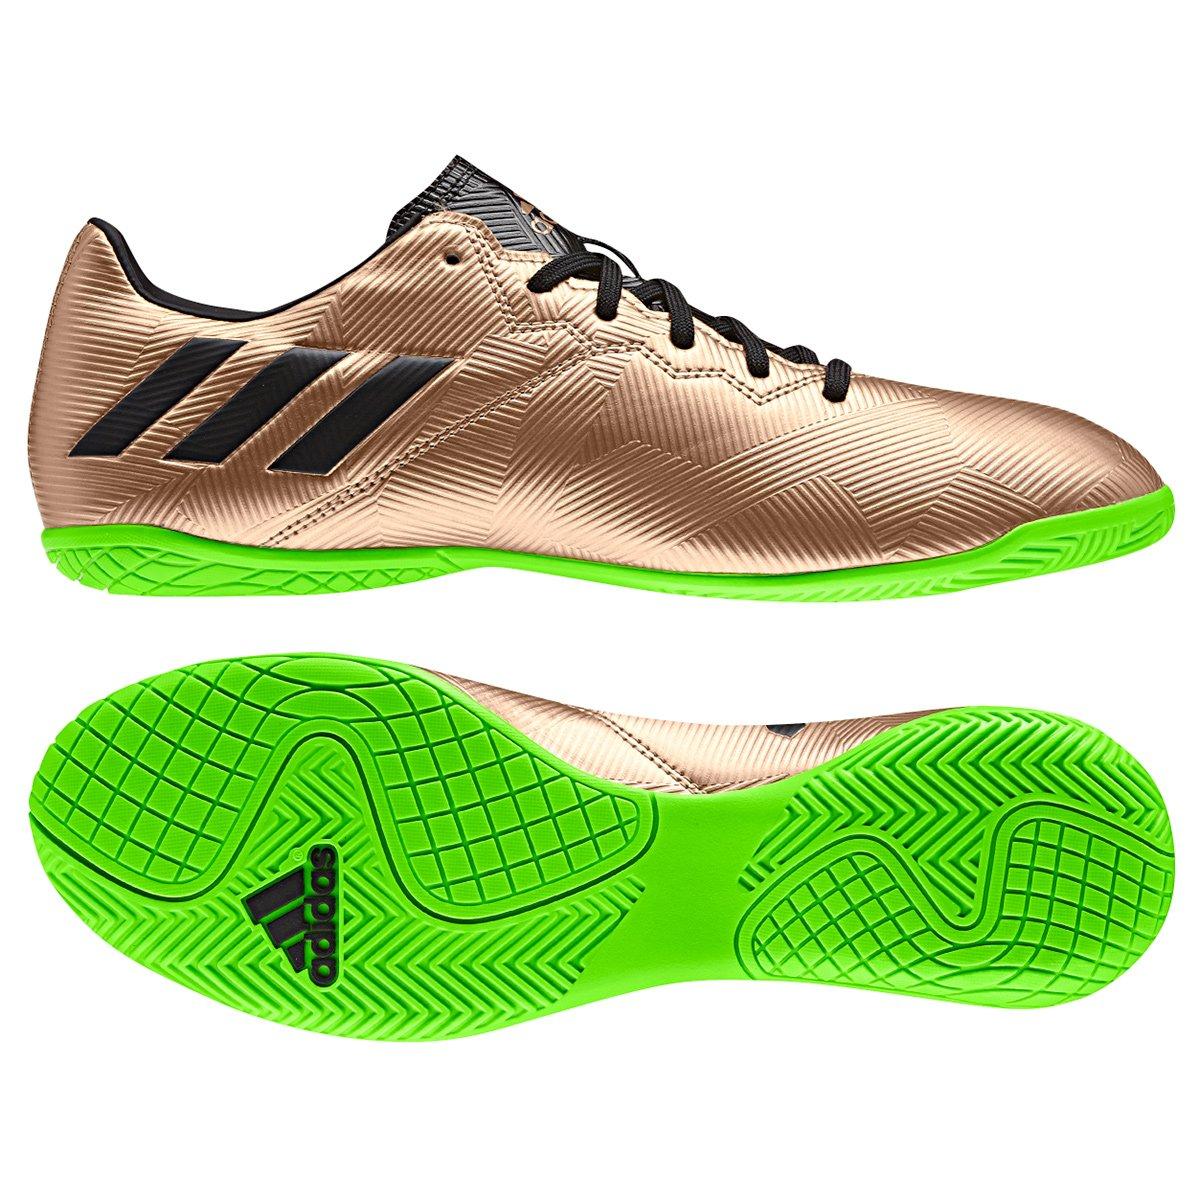 151482d63bc40 Chuteira Futsal Adidas Messi 16.4 IN Masculina - Compre Agora